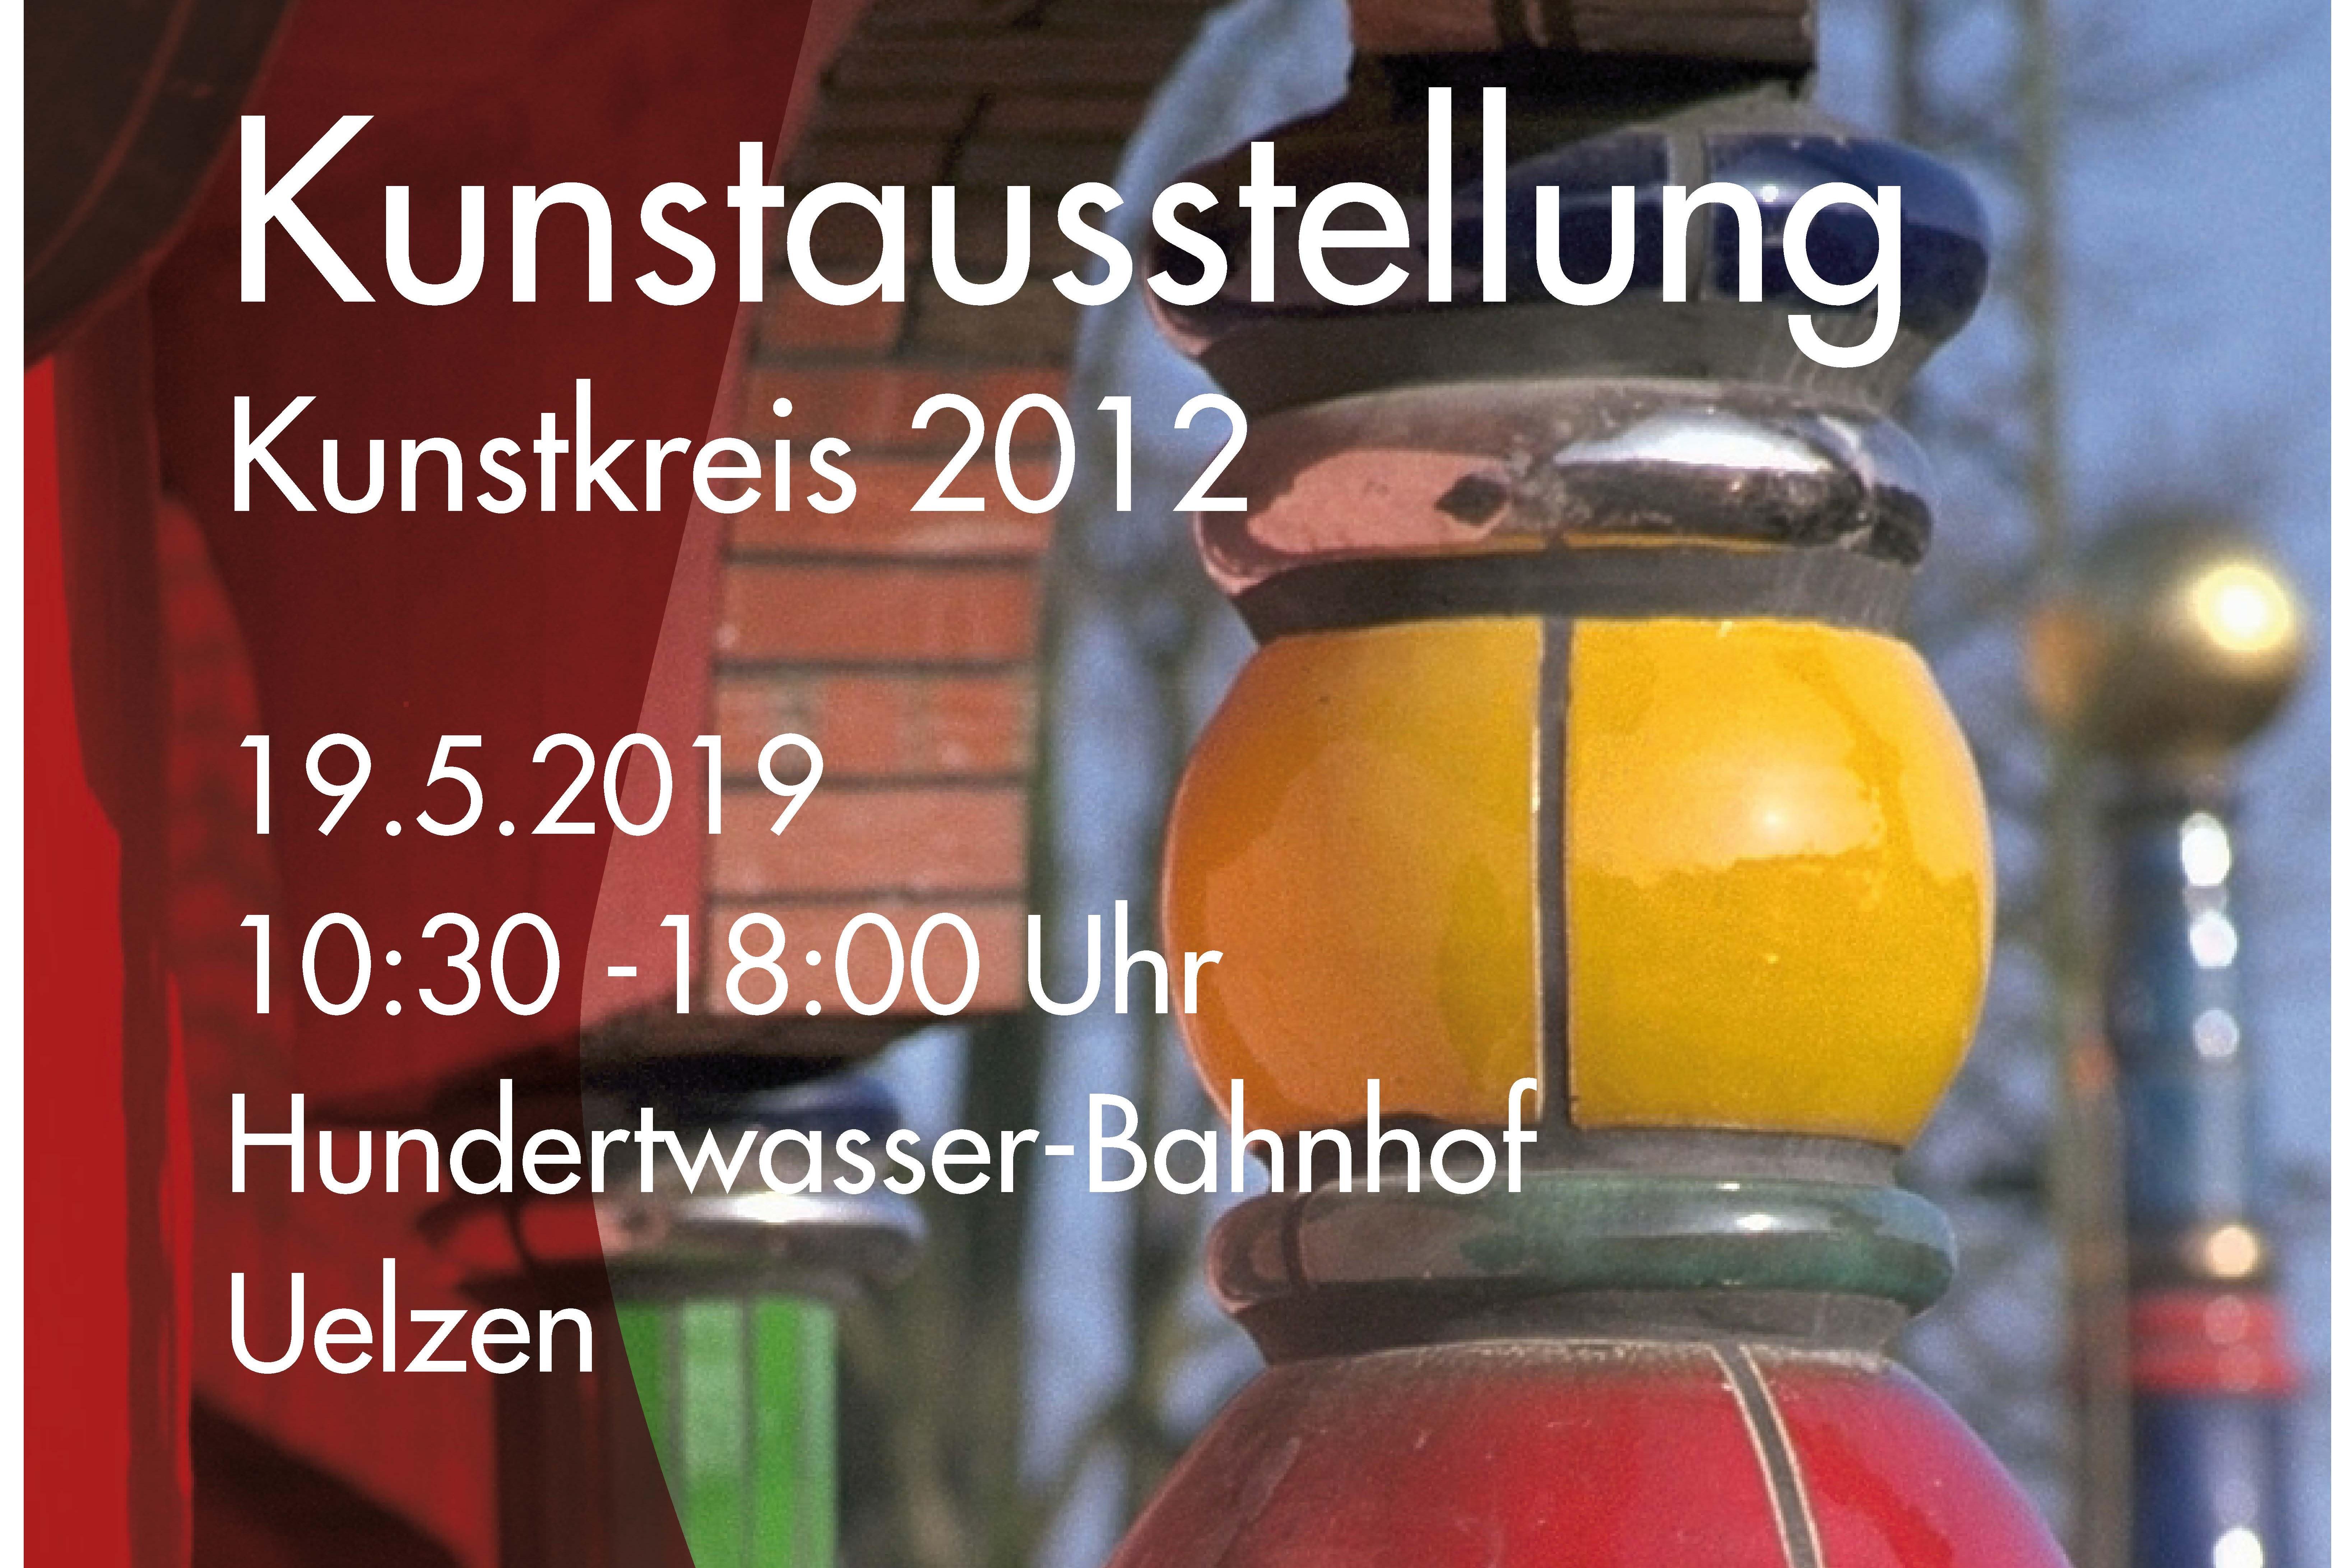 Kunstausstellung Kunstkreis 2012